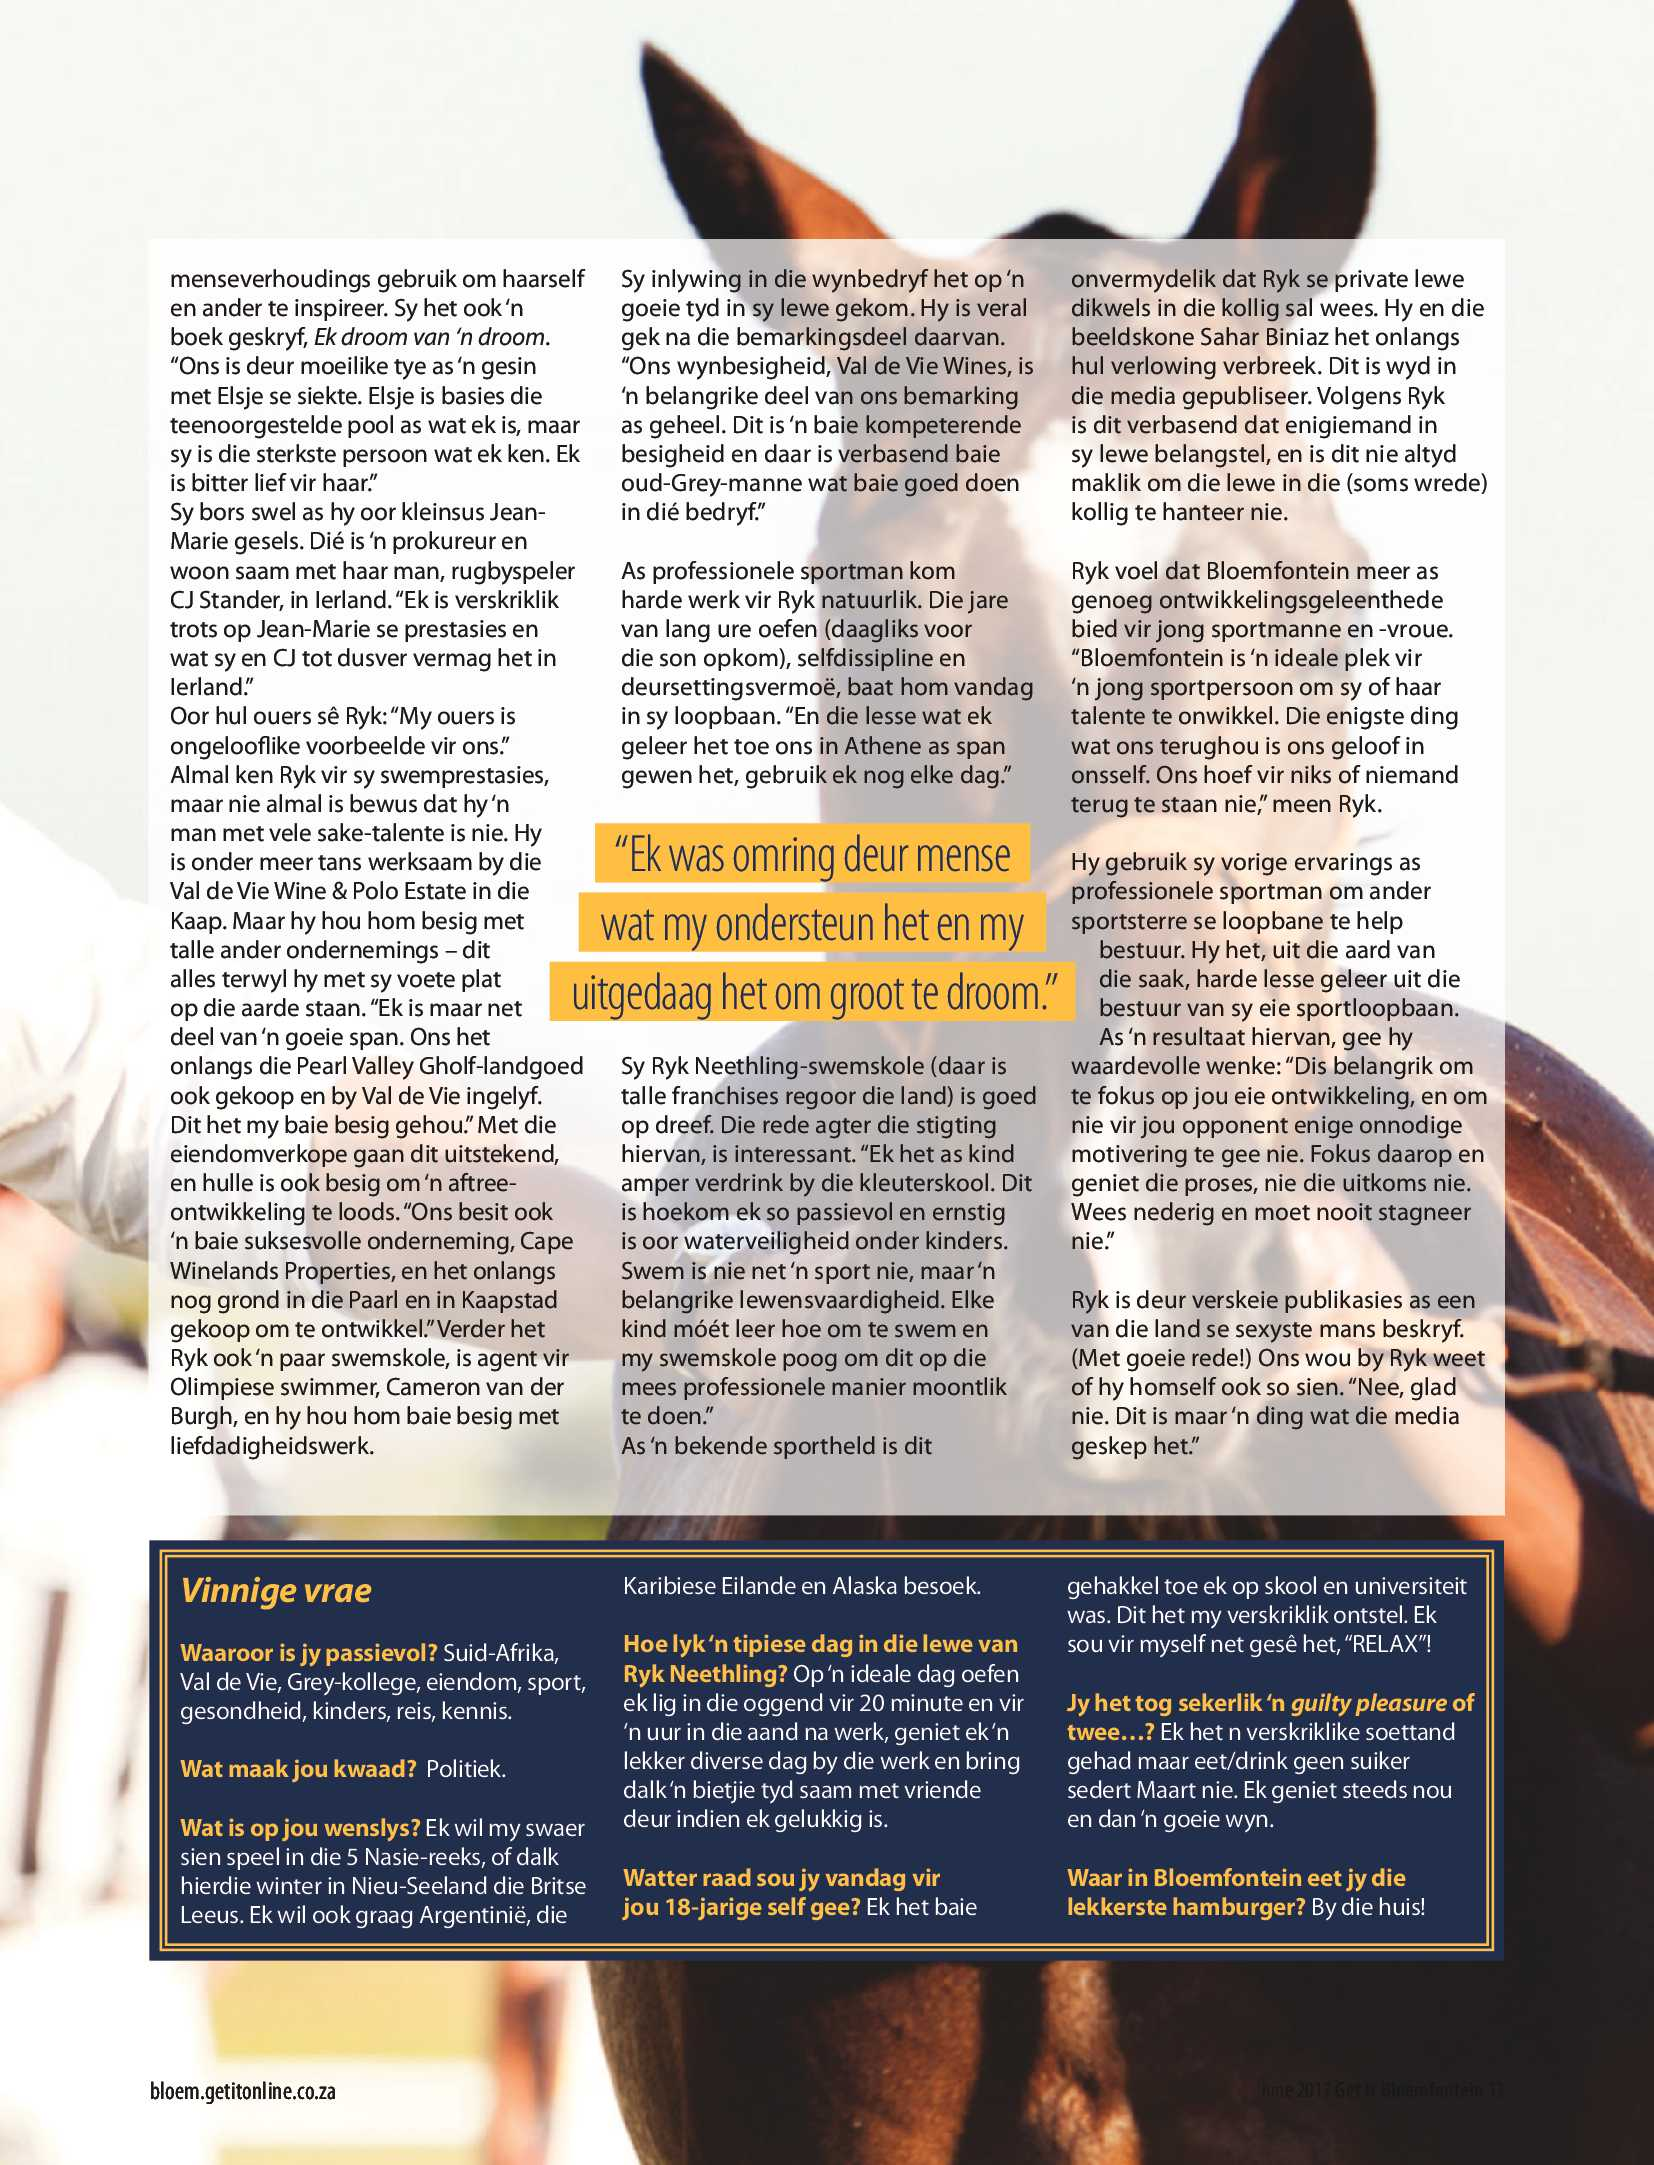 get-bloemfontein-june-2017-epapers-page-15